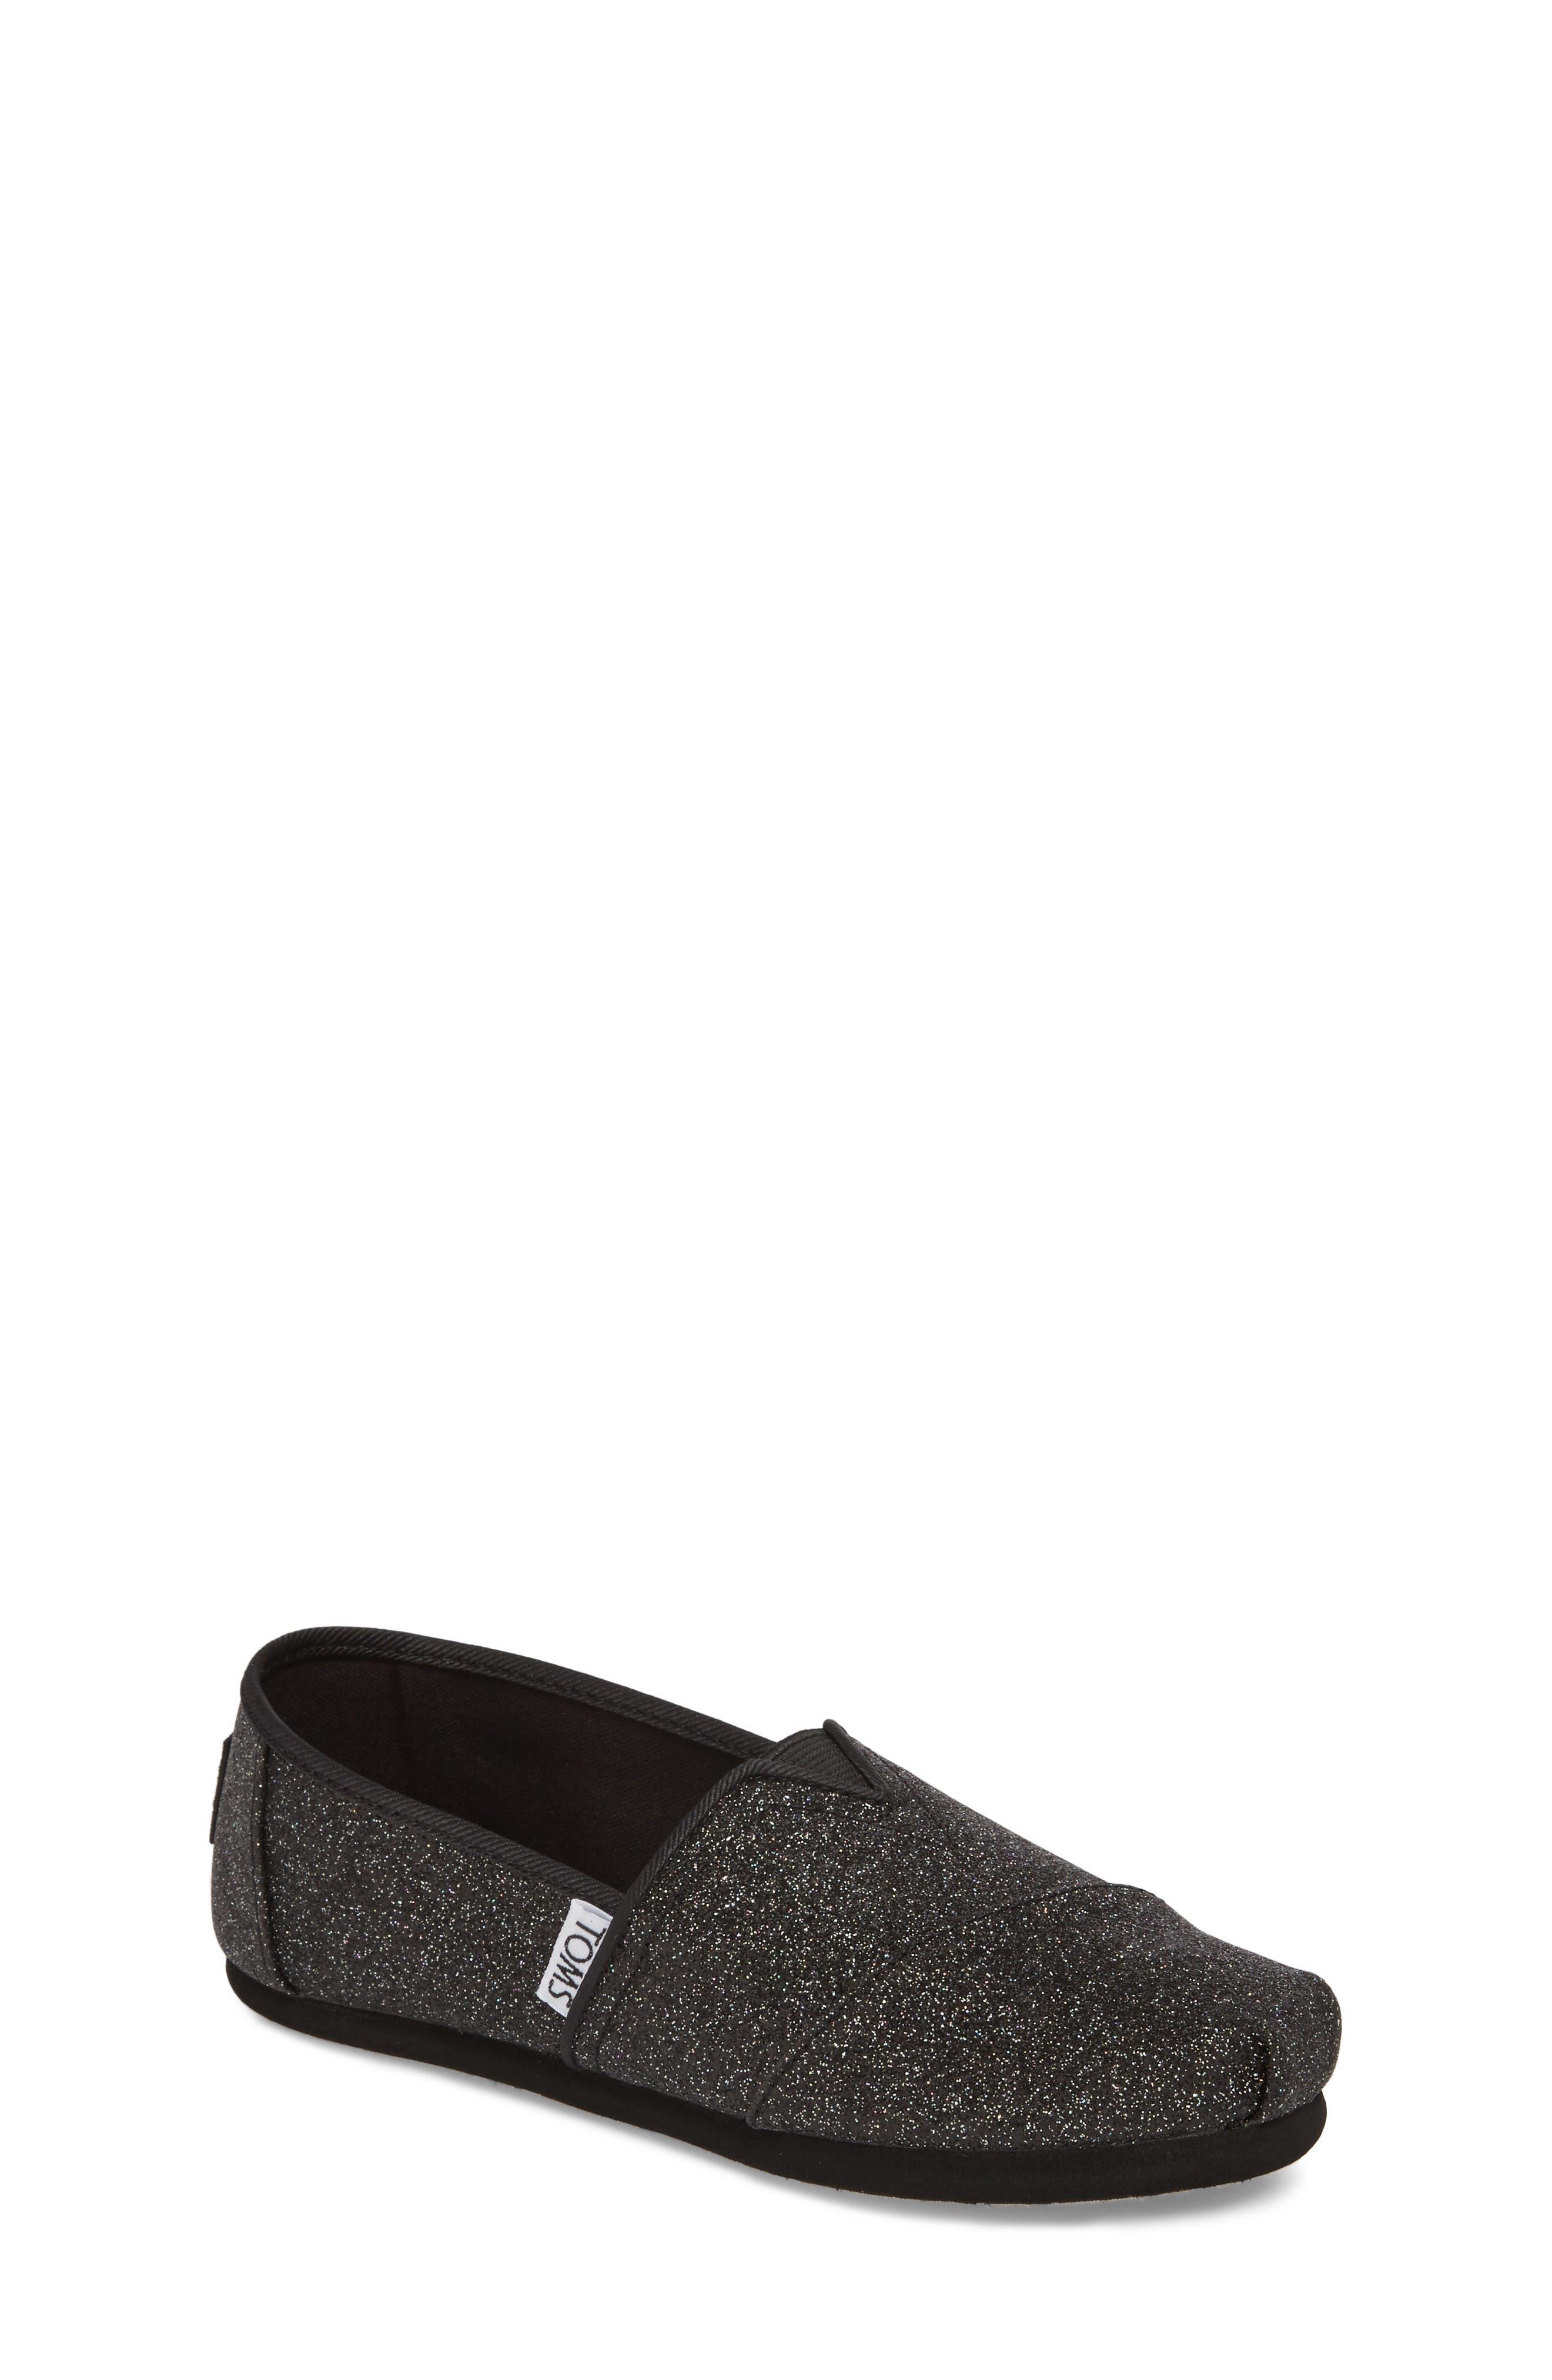 7760f6b65ca TOMS Little Kid Shoes (Sizes 12.5-3)